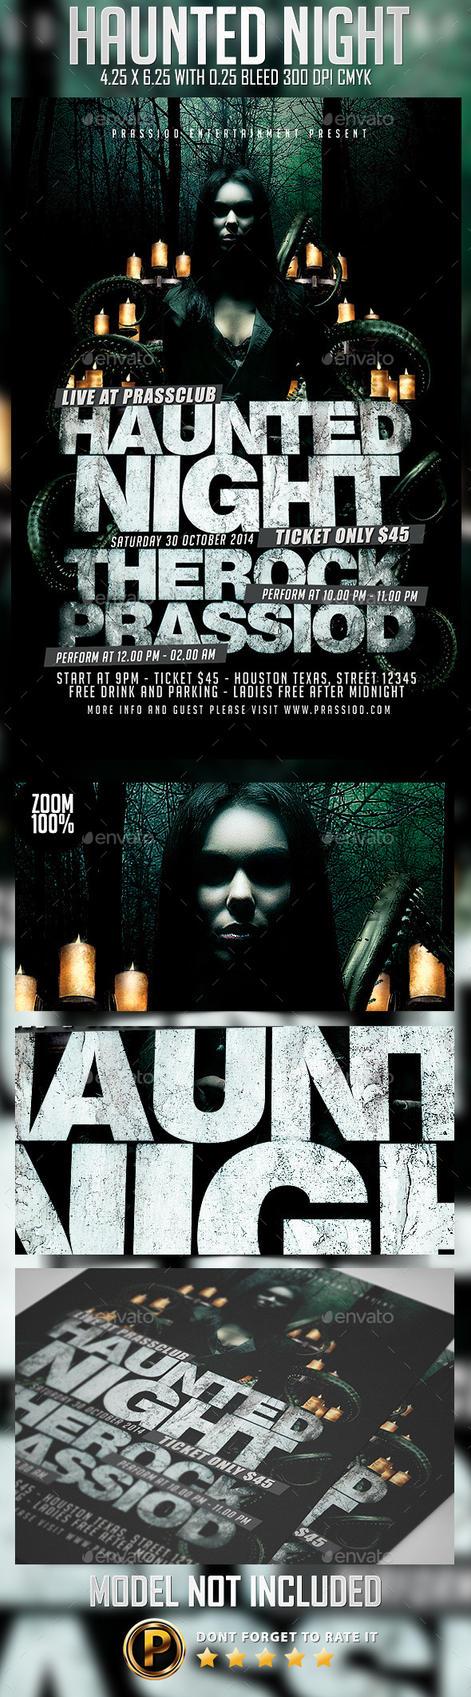 Haunted Night Flyer Template by prassetyo